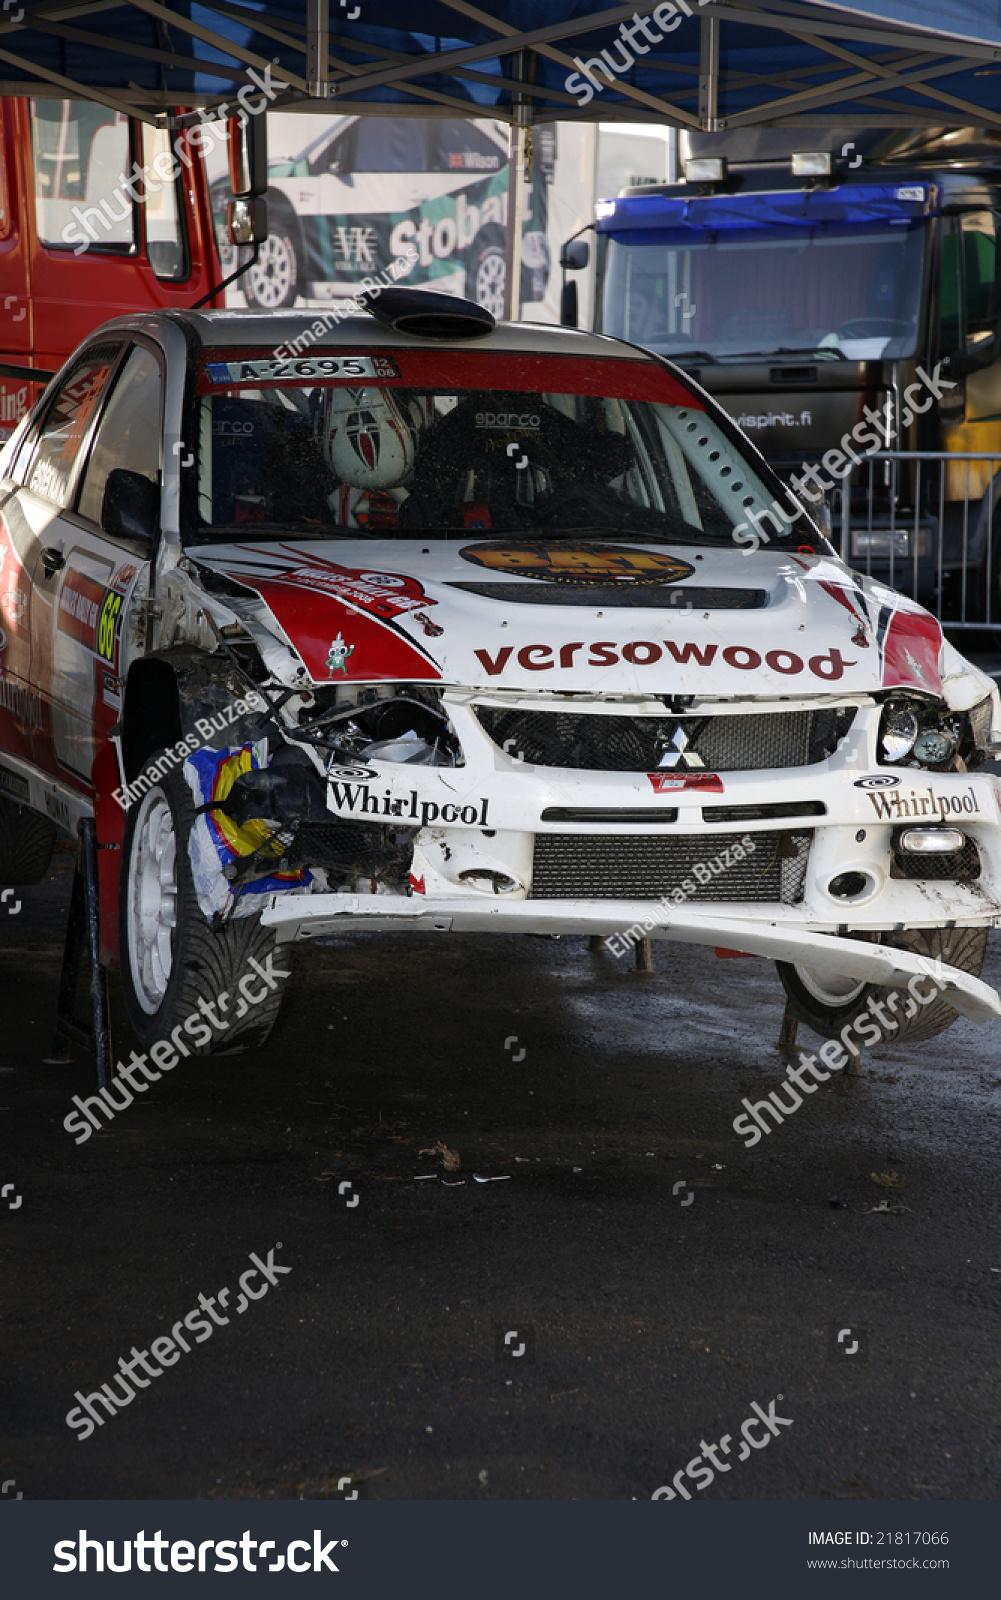 Damaged Mitsubishi Rally Car Service Area Stock Photo 21817066 ...